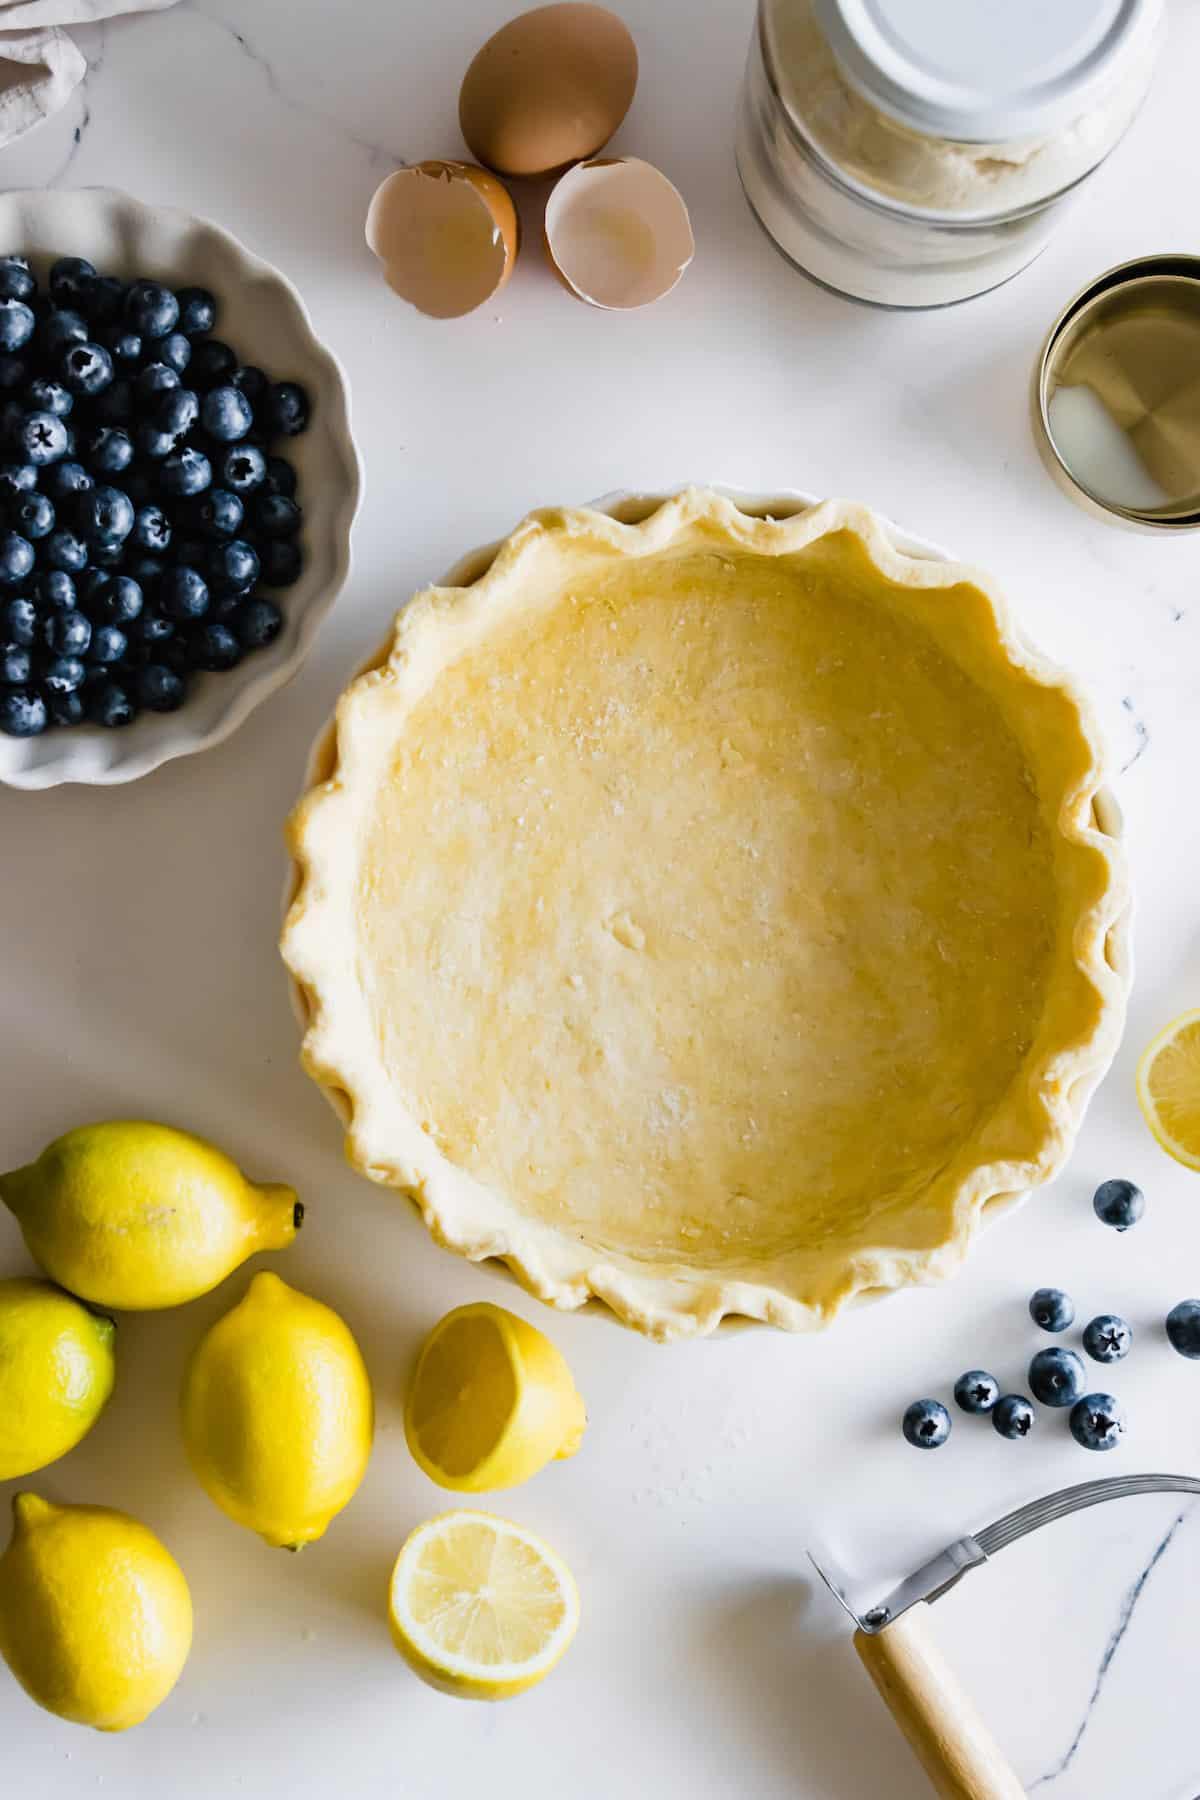 A Homemade Pie Crust, Fresh Lemons, Fresh Blueberries and Egg Shells on a Countertop